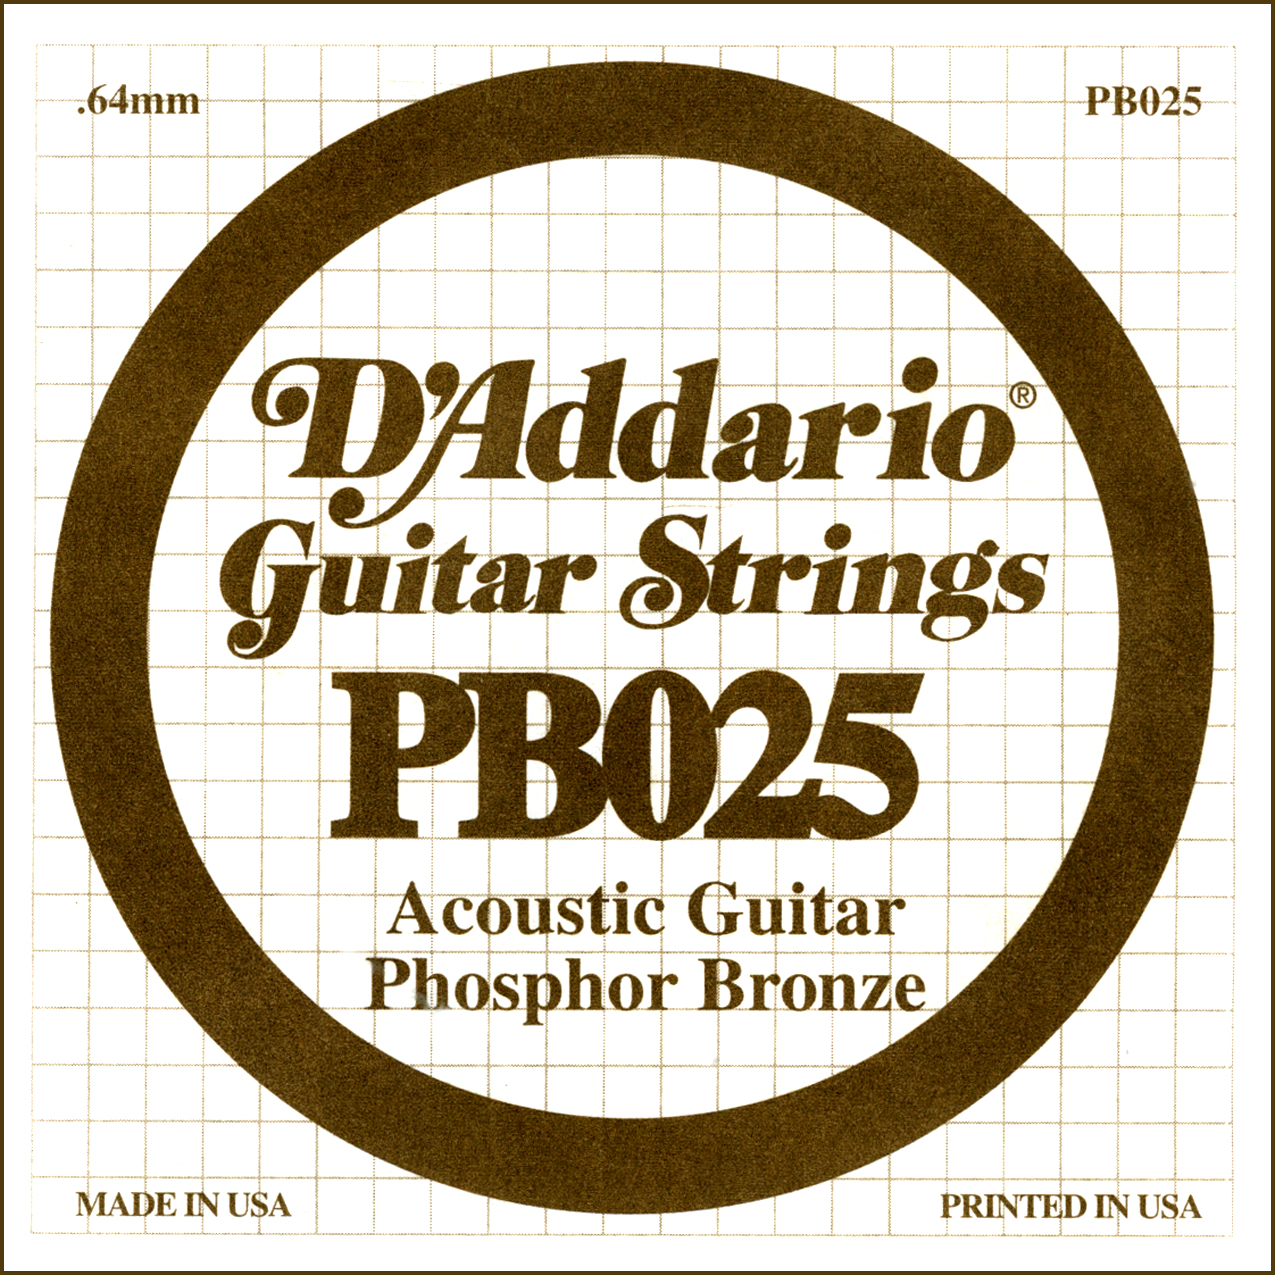 D'ADDARIO PB025 PHOSPHOR BROZ SINGLE STRING